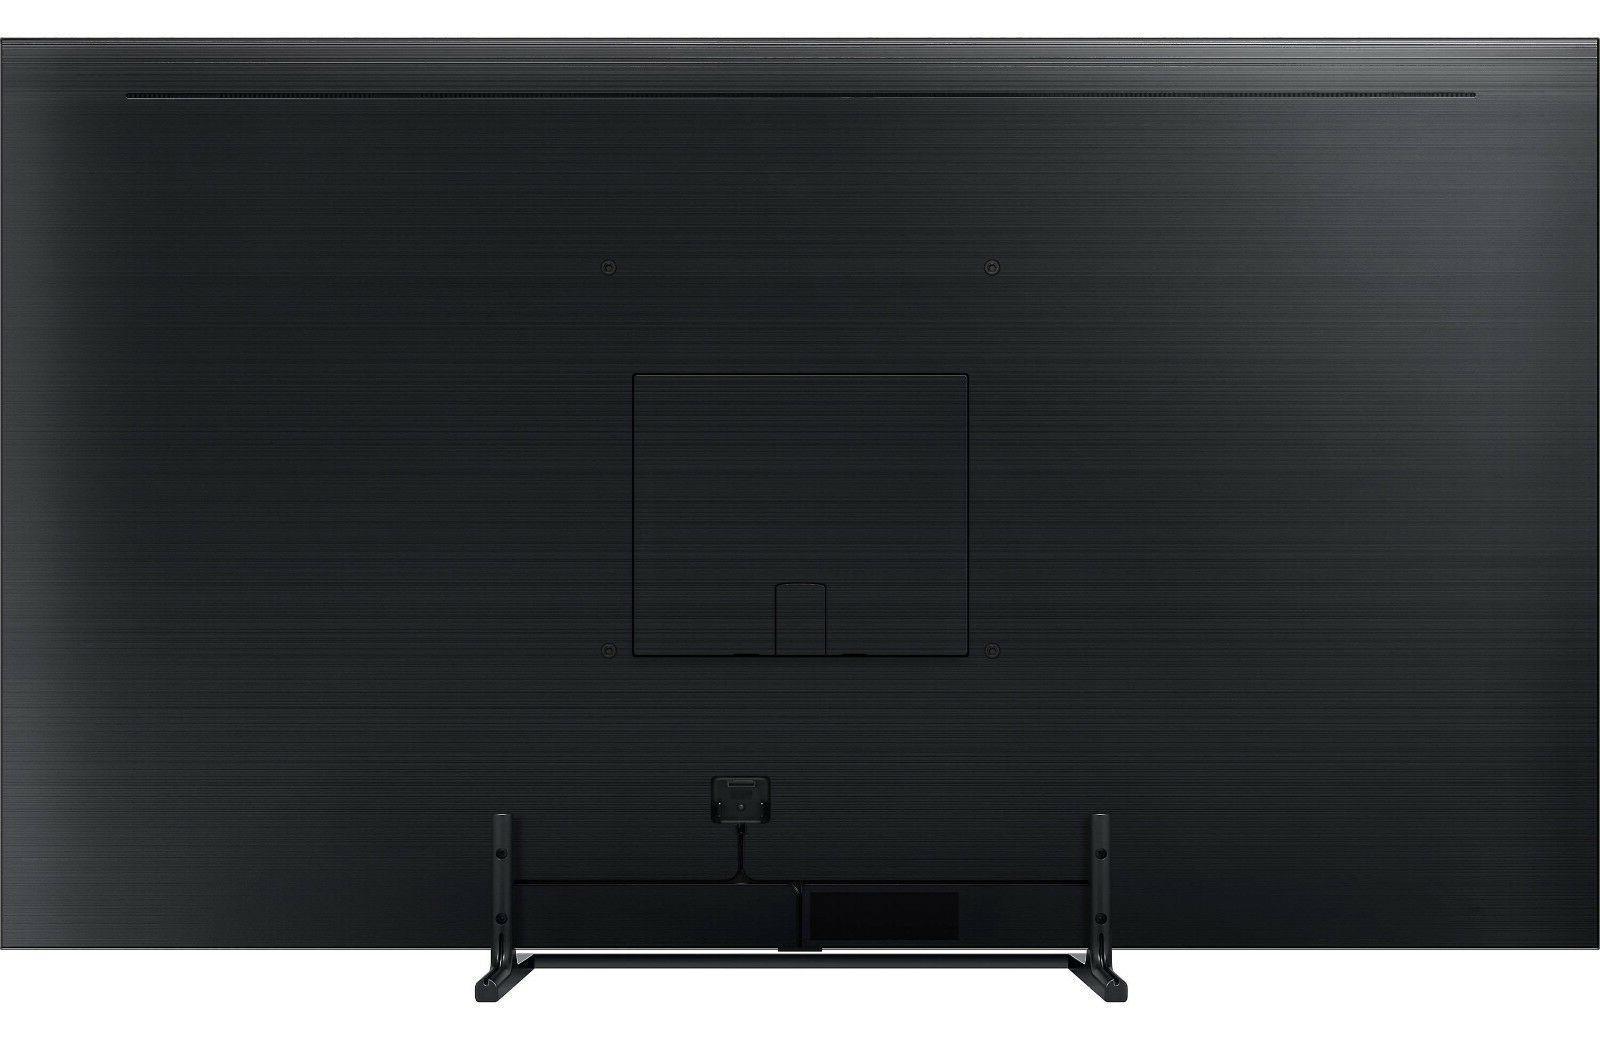 Samsung QN65Q9FN Smart TV